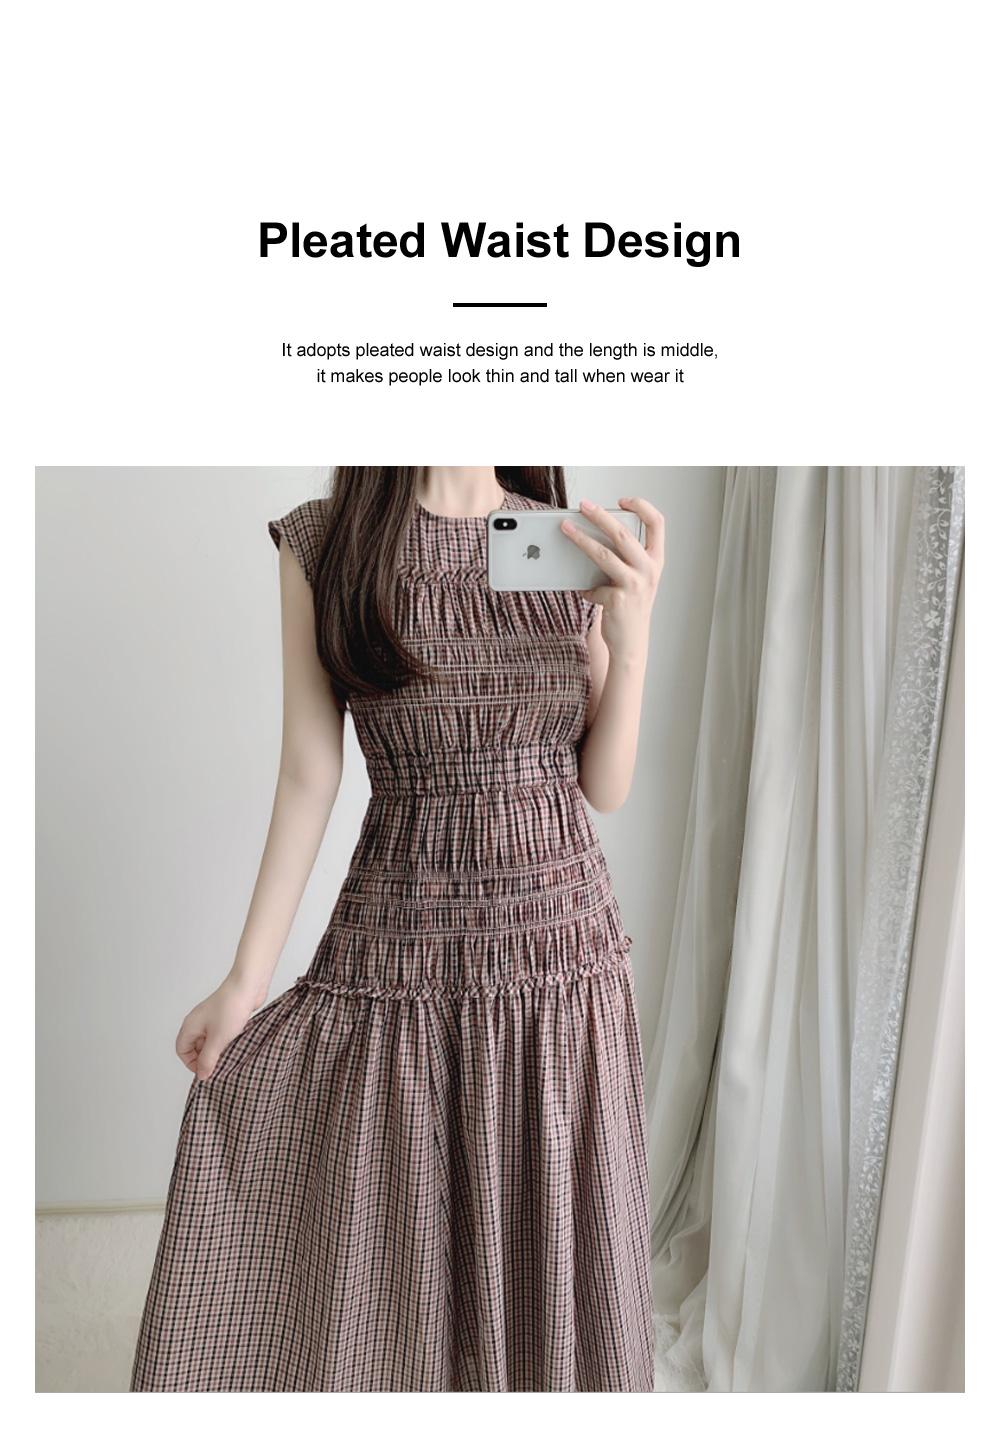 Female Vintage Dress Summer New Sleeveless Round Neck Plaid Women Elegant Thin Pleated Waist Casual Dress 1